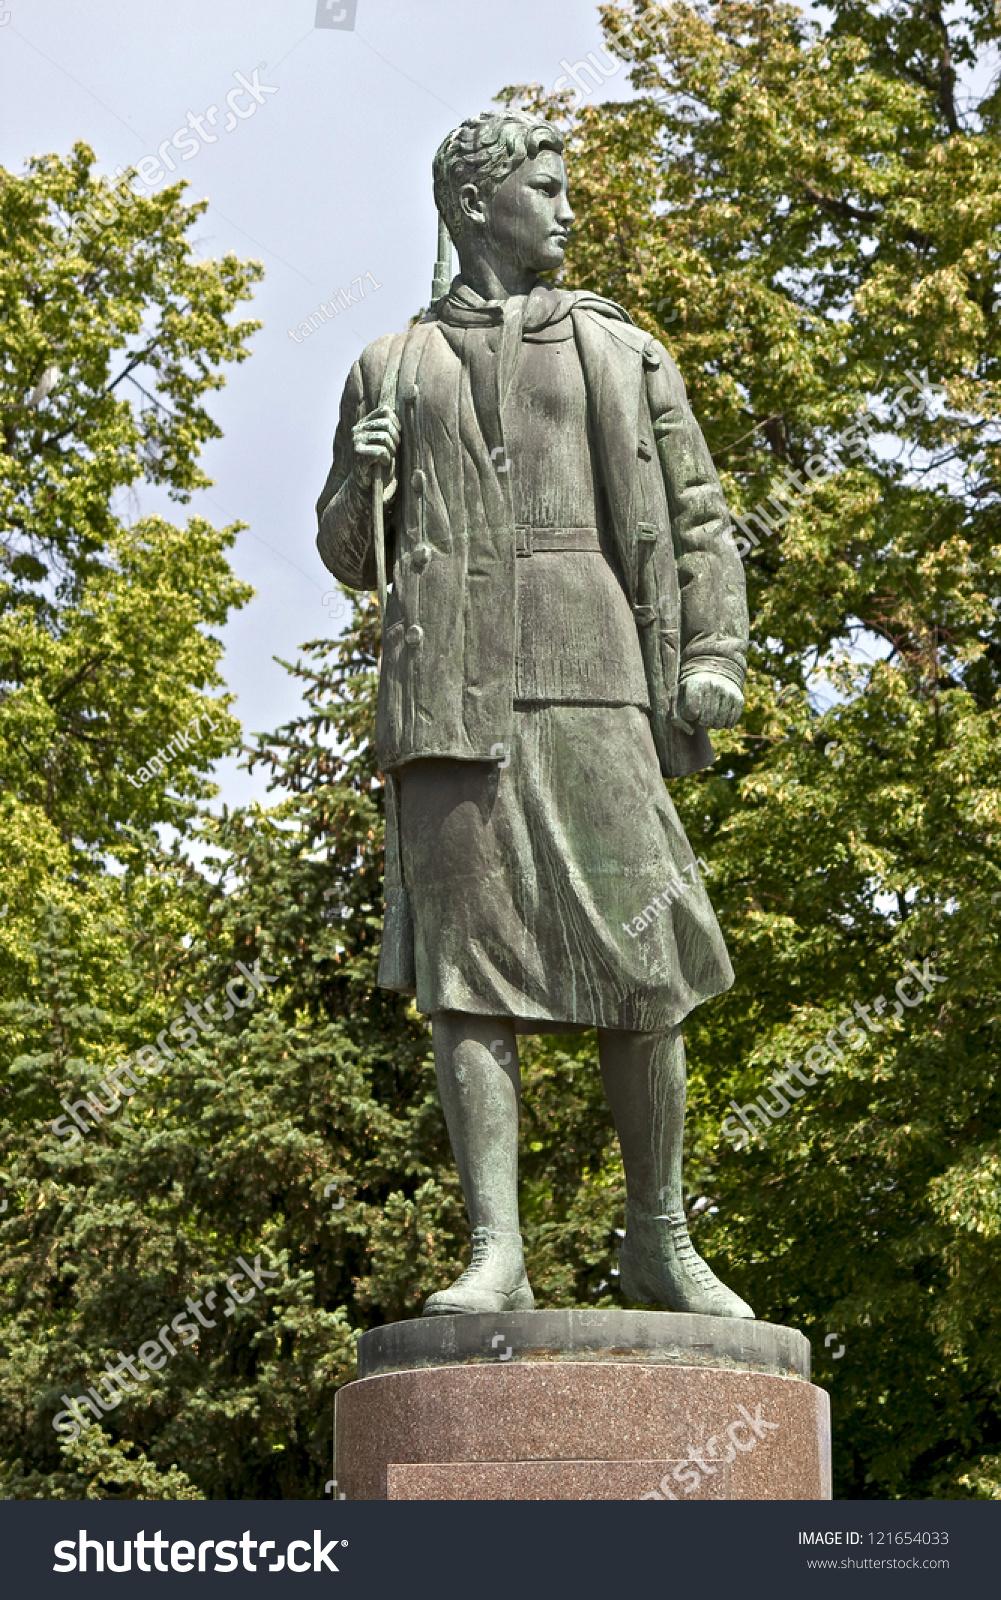 Soviet memorial dedicated to cosmonauts from kaliningrad - Monument Of Zoya Kosmodemyanskaya 1923 1941 Soviet Partisan Hero Of Soviet